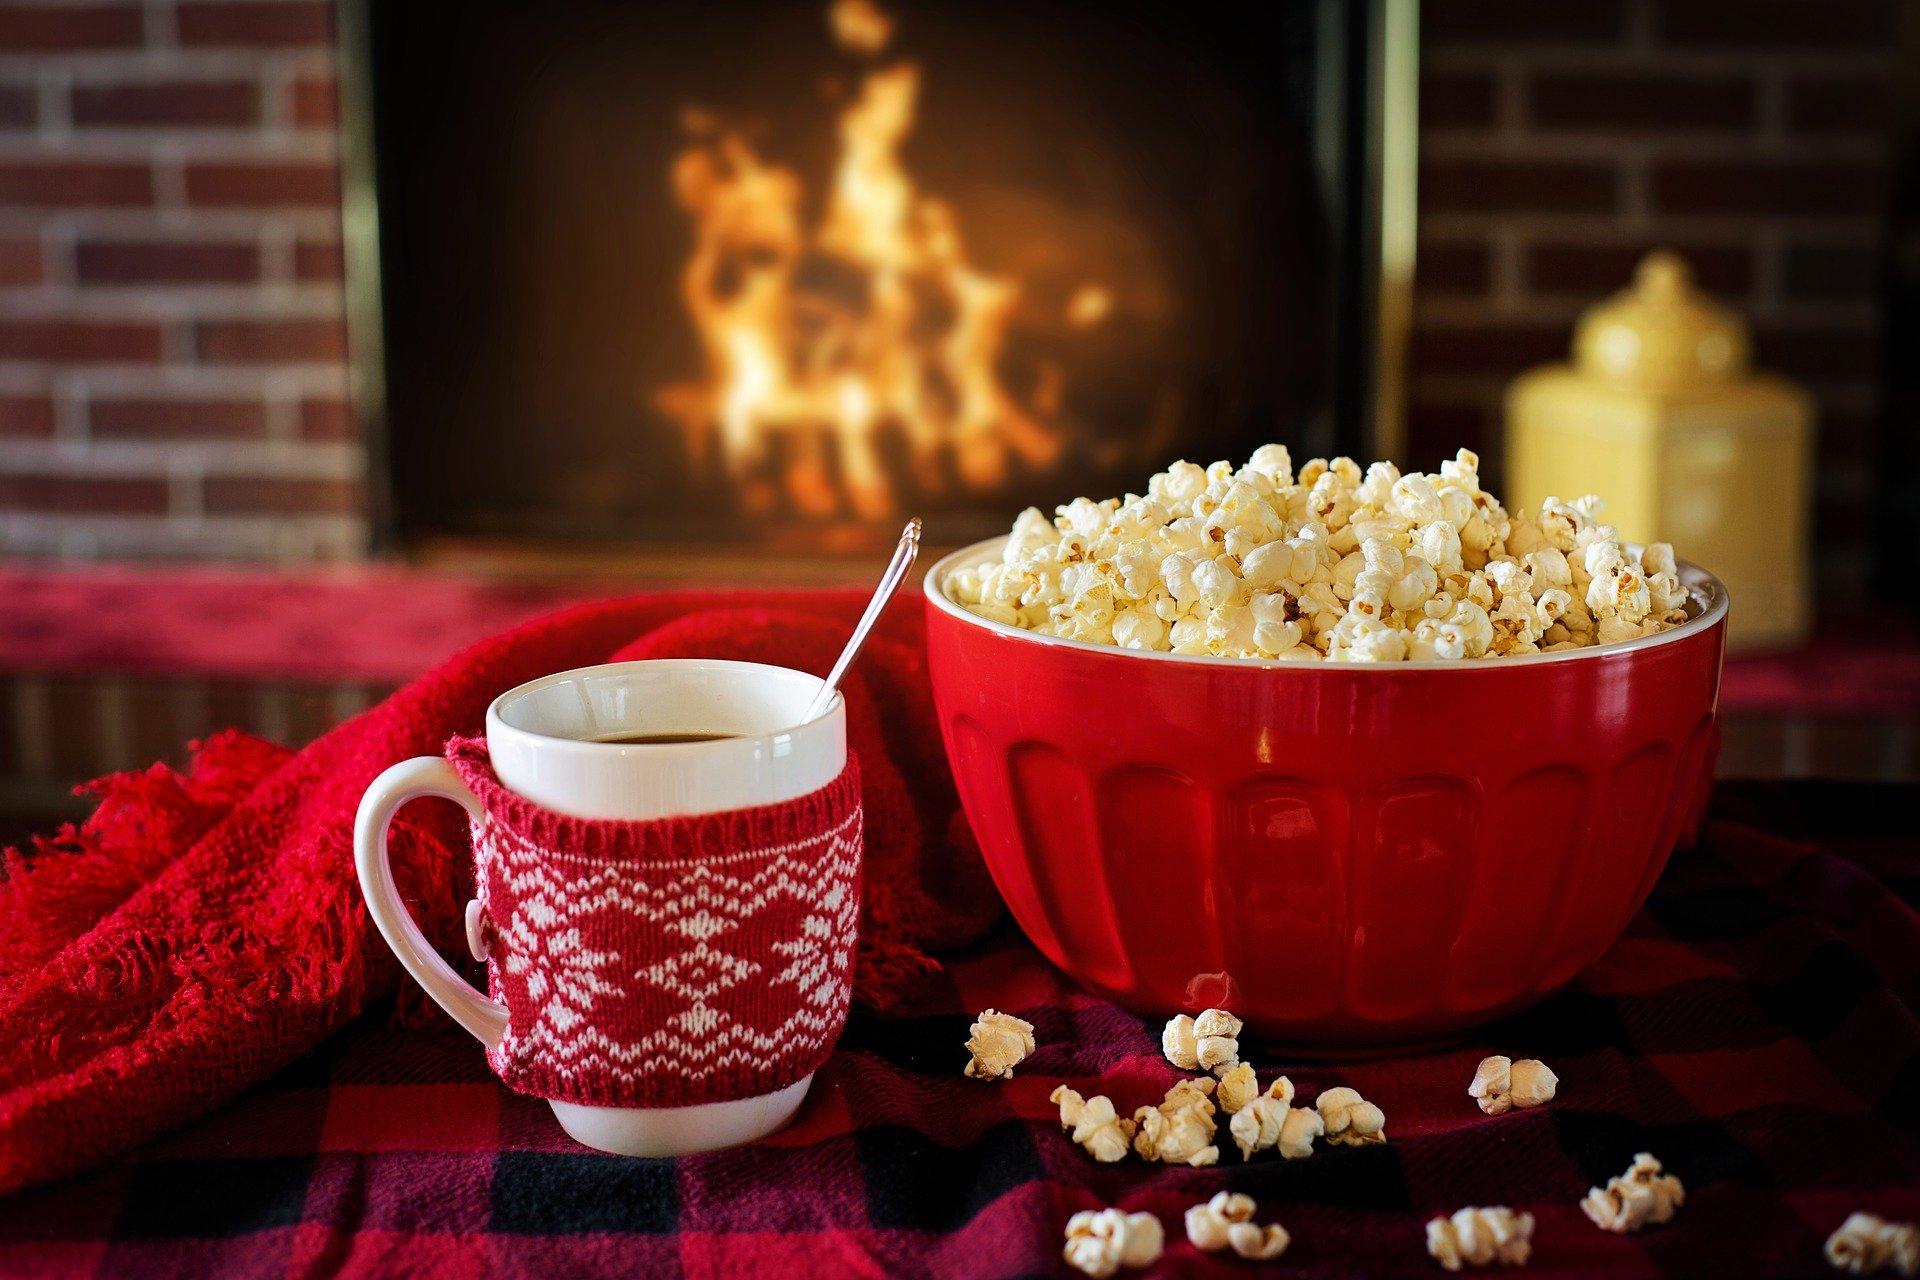 Filmabend Familie mit Popcorn